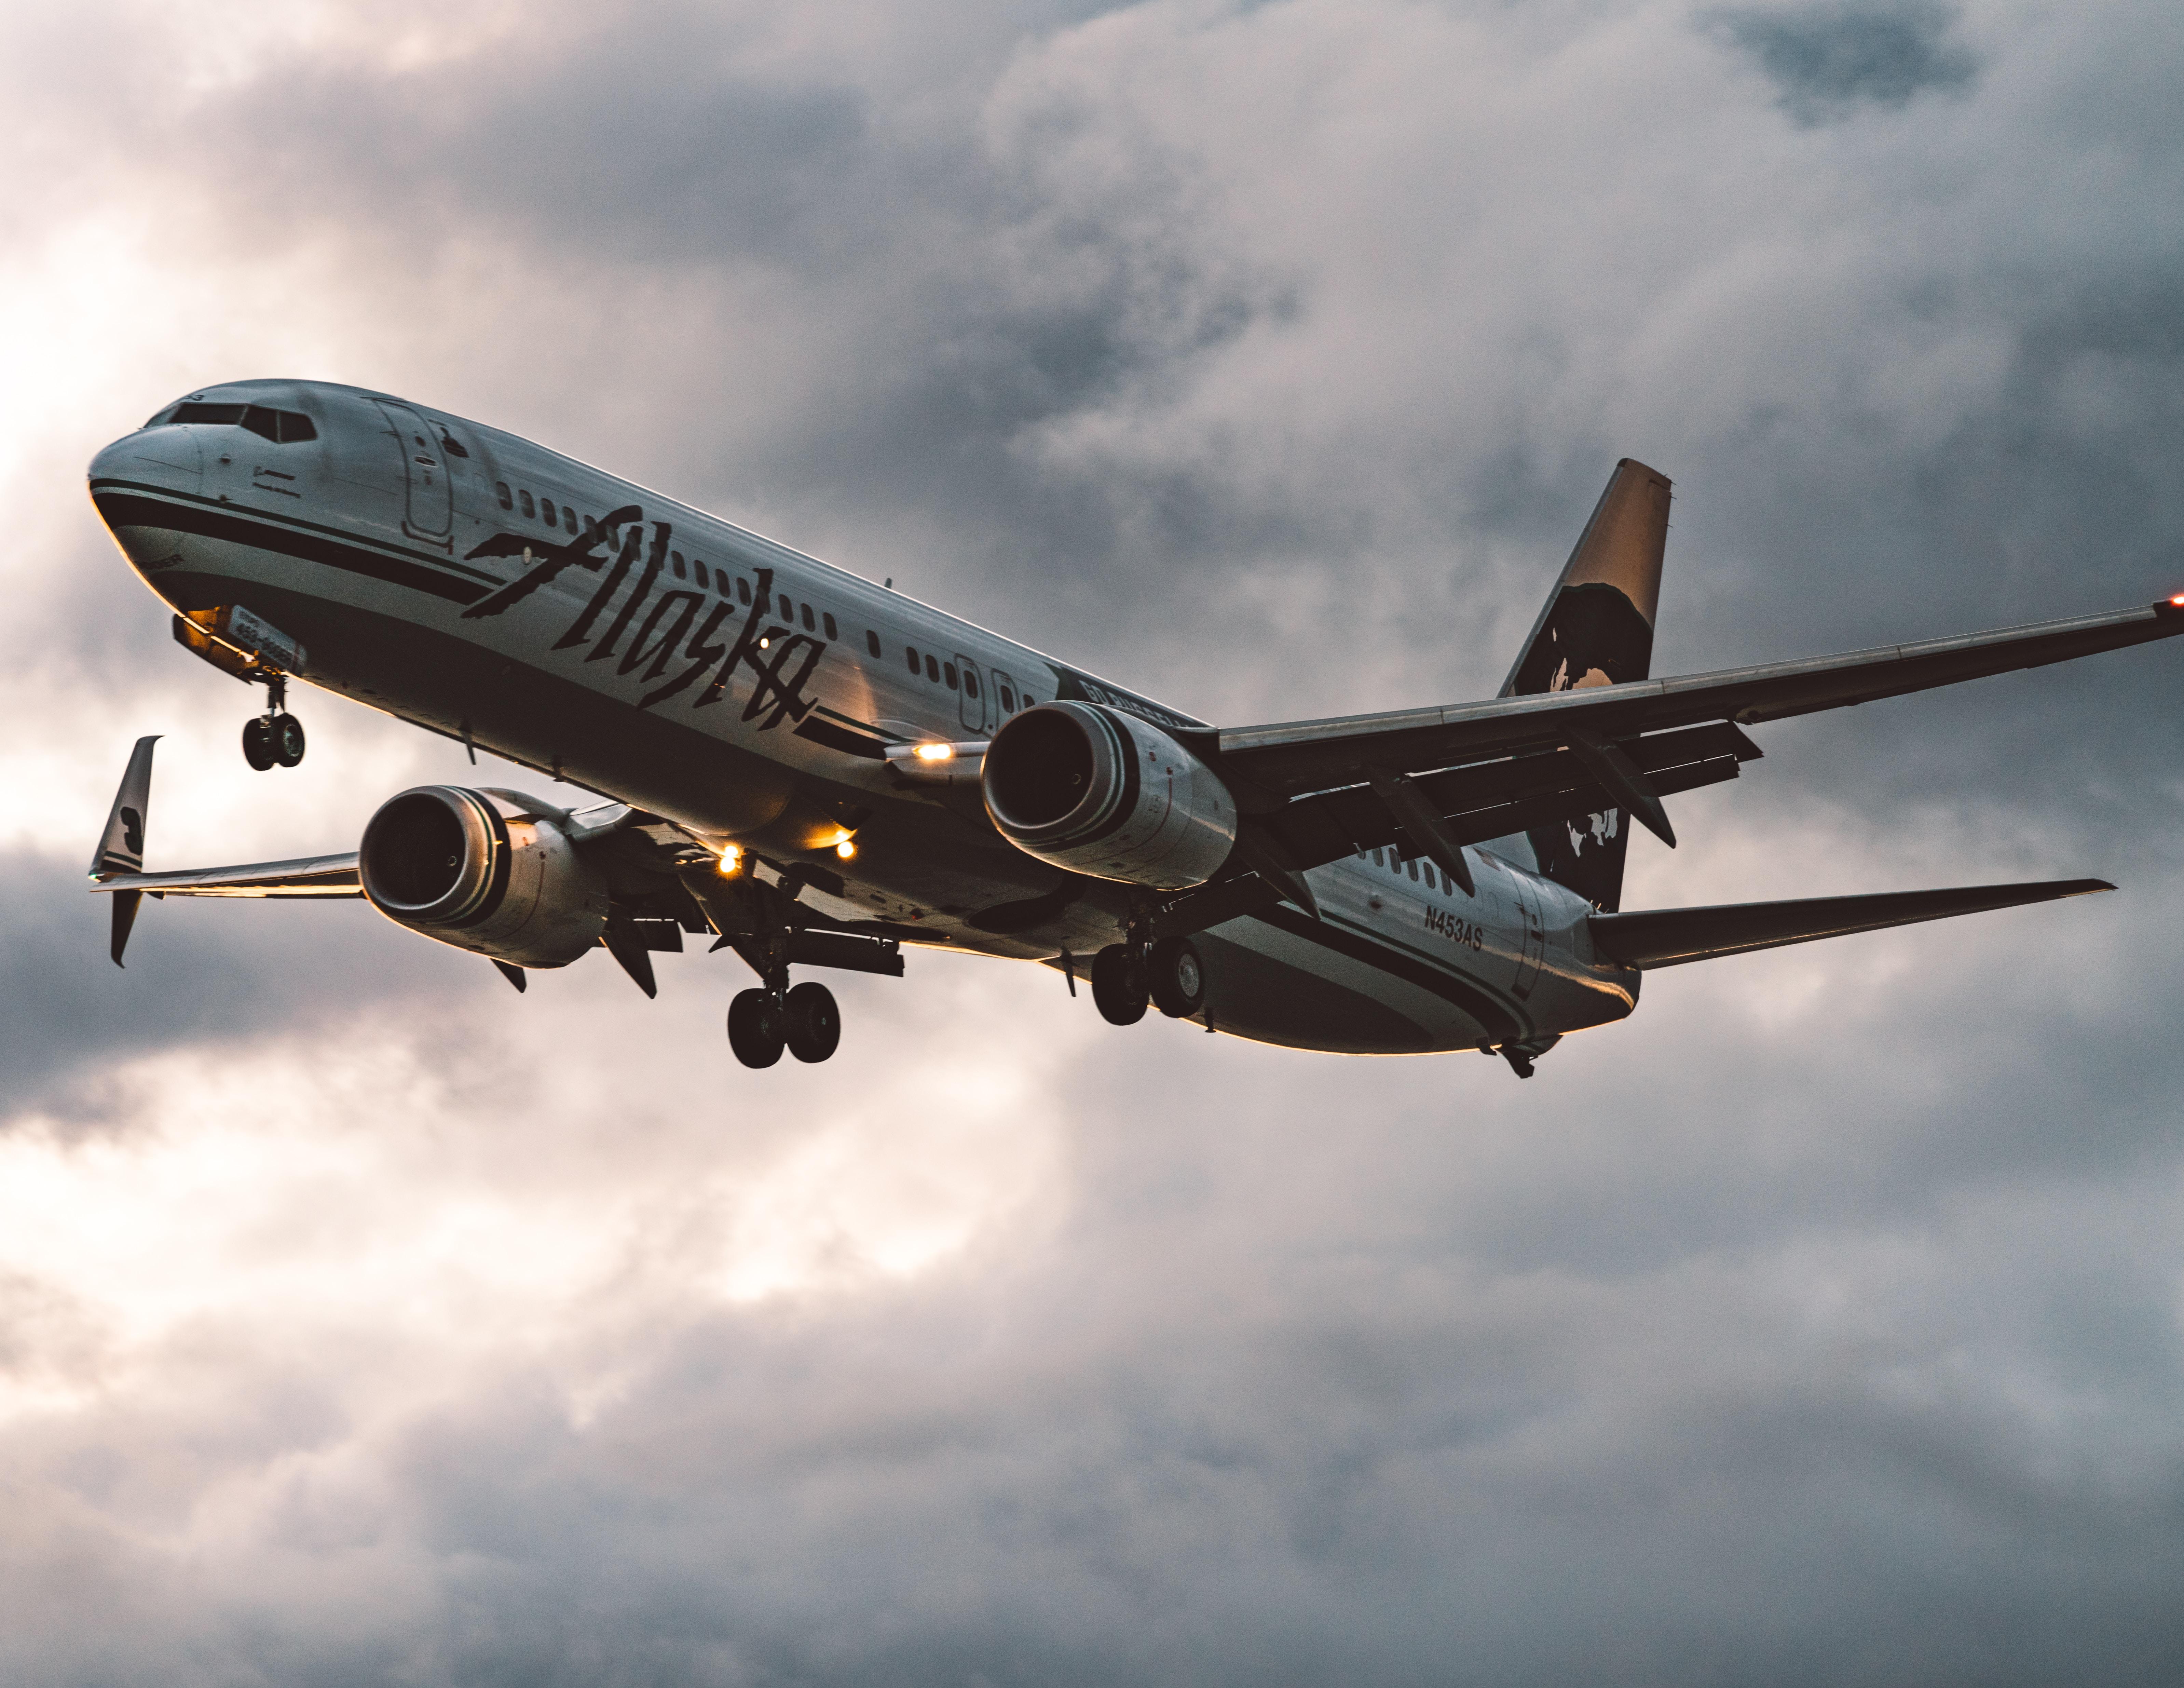 Alaska passenger plane about to land